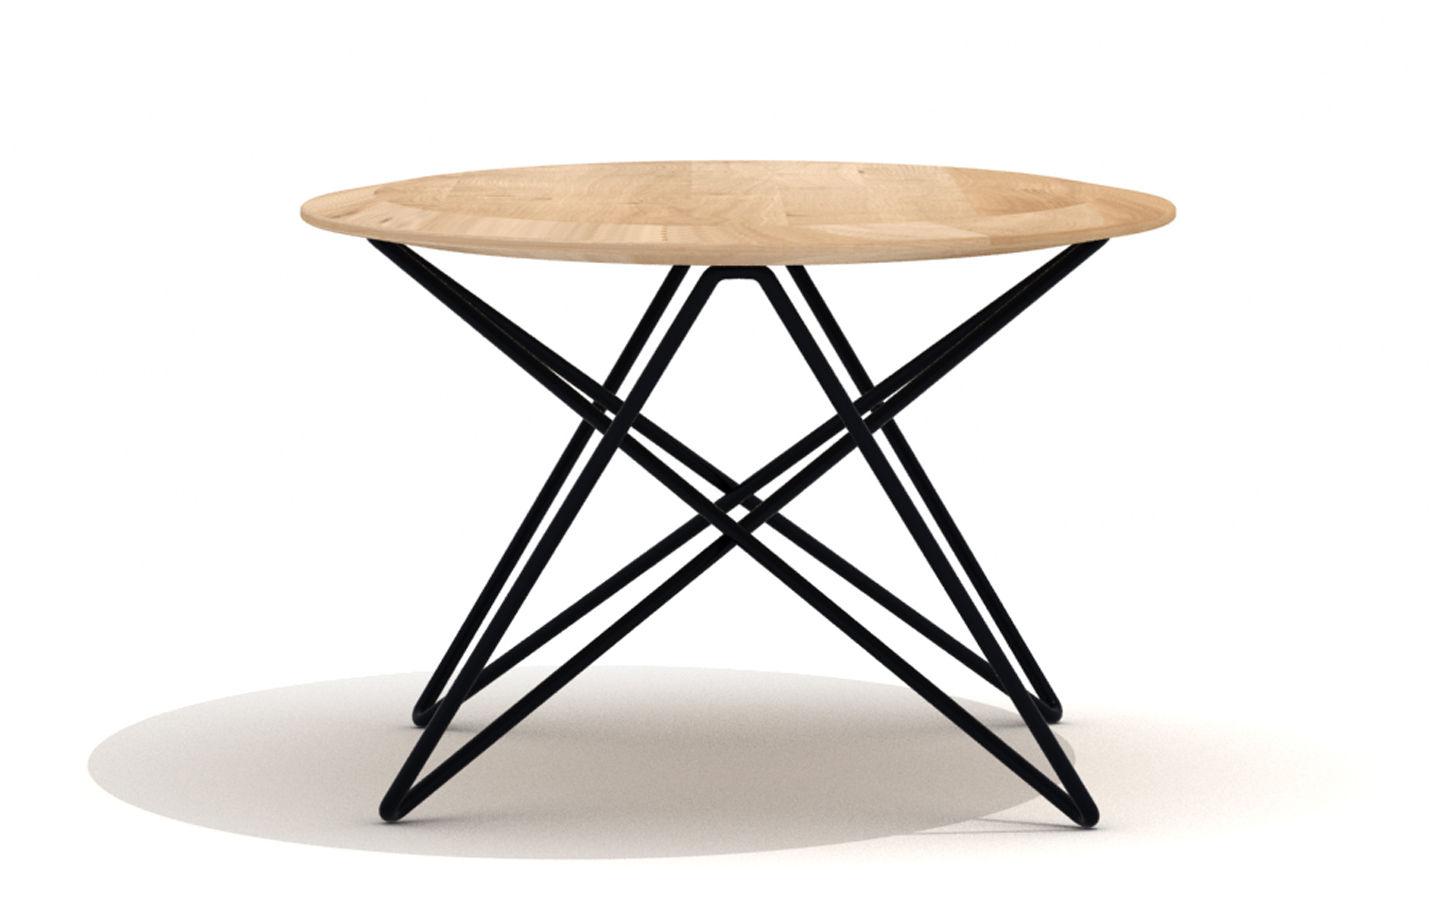 Orb Coffee Table L 130 Cm Natural Wood Black Leg By Universo  # Meuble Tv Universo Positivo